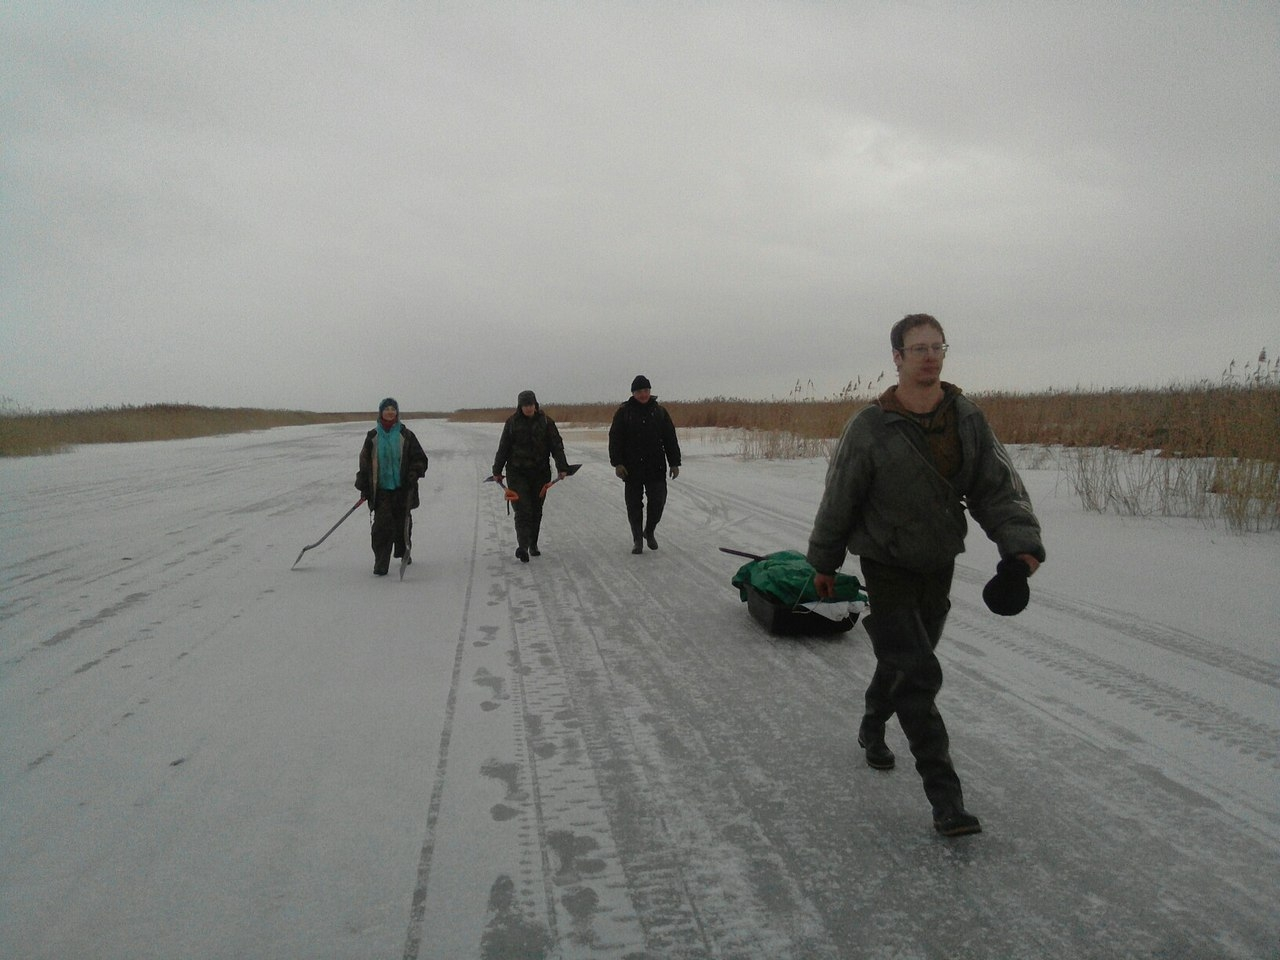 Работа Центра в феврале 2017 г.